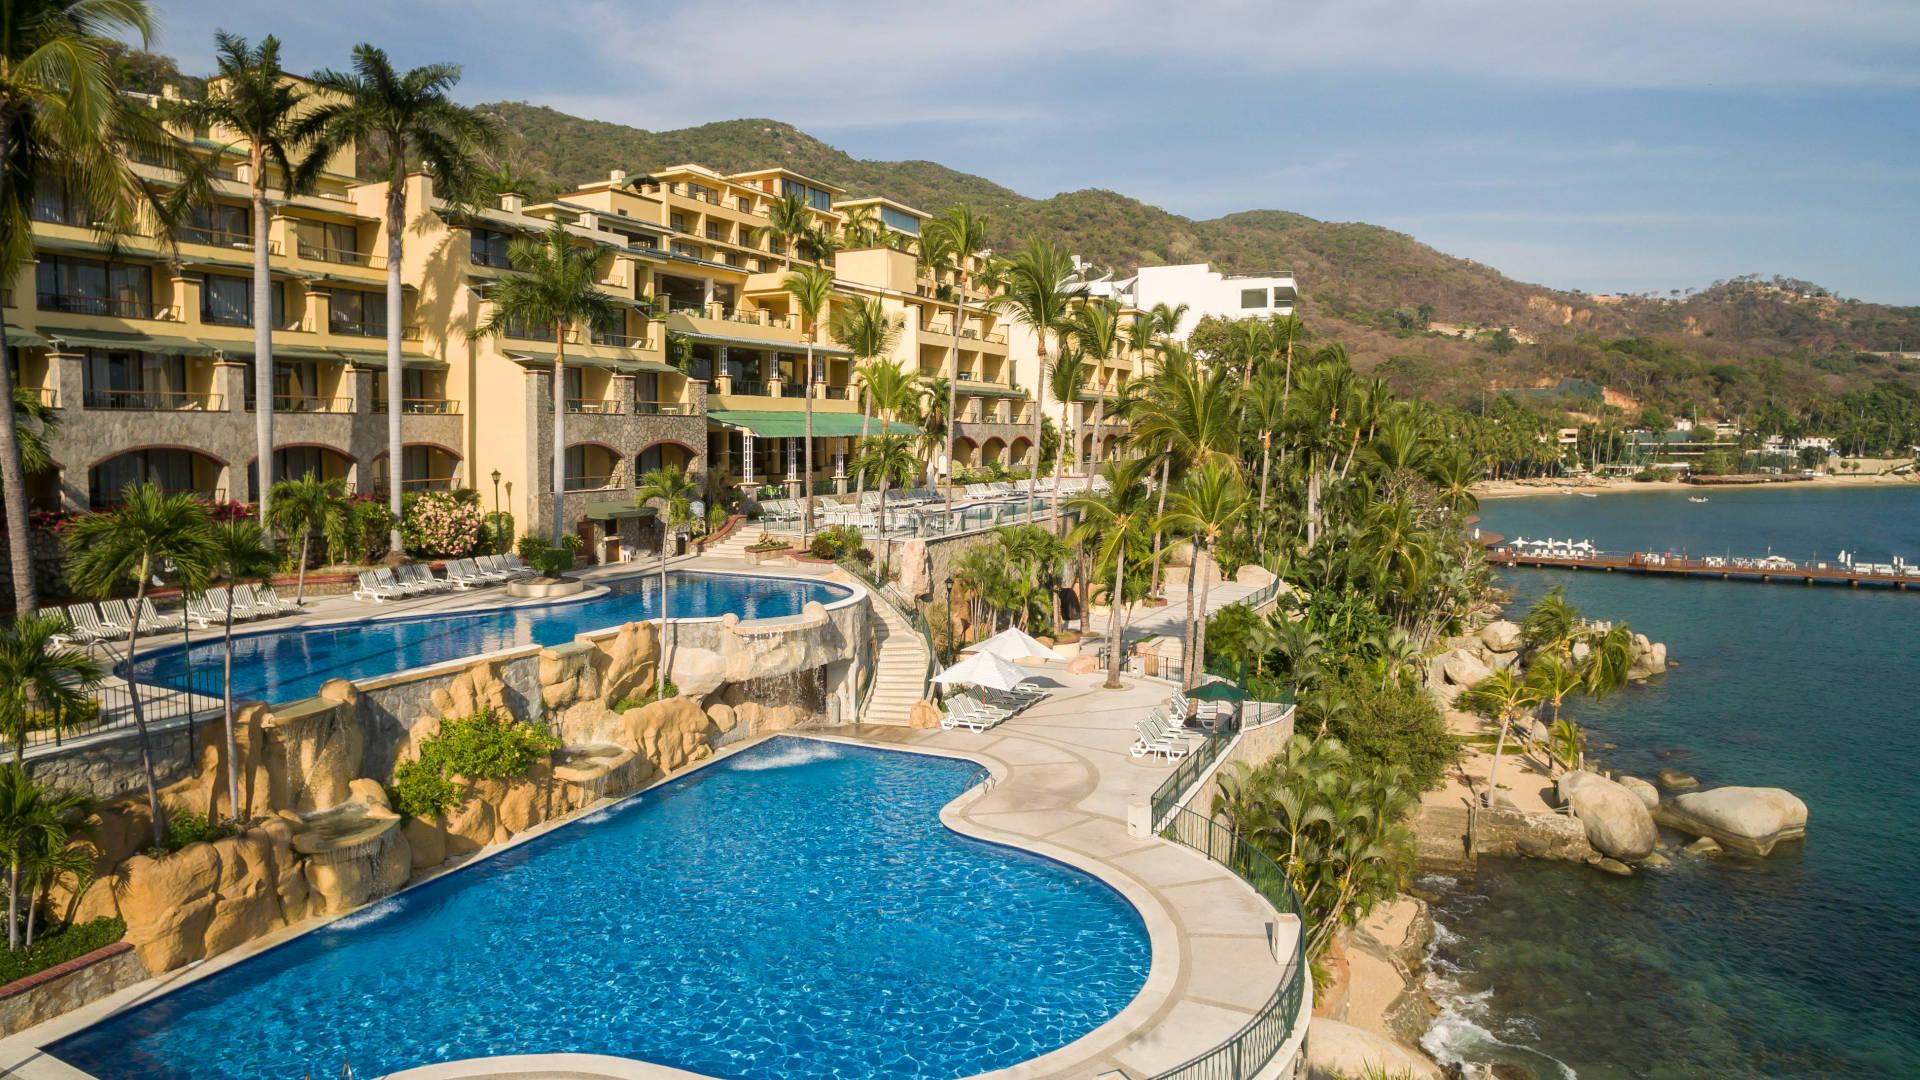 Camino Real Acapulco Diamante - best hotels in acapulco mexico